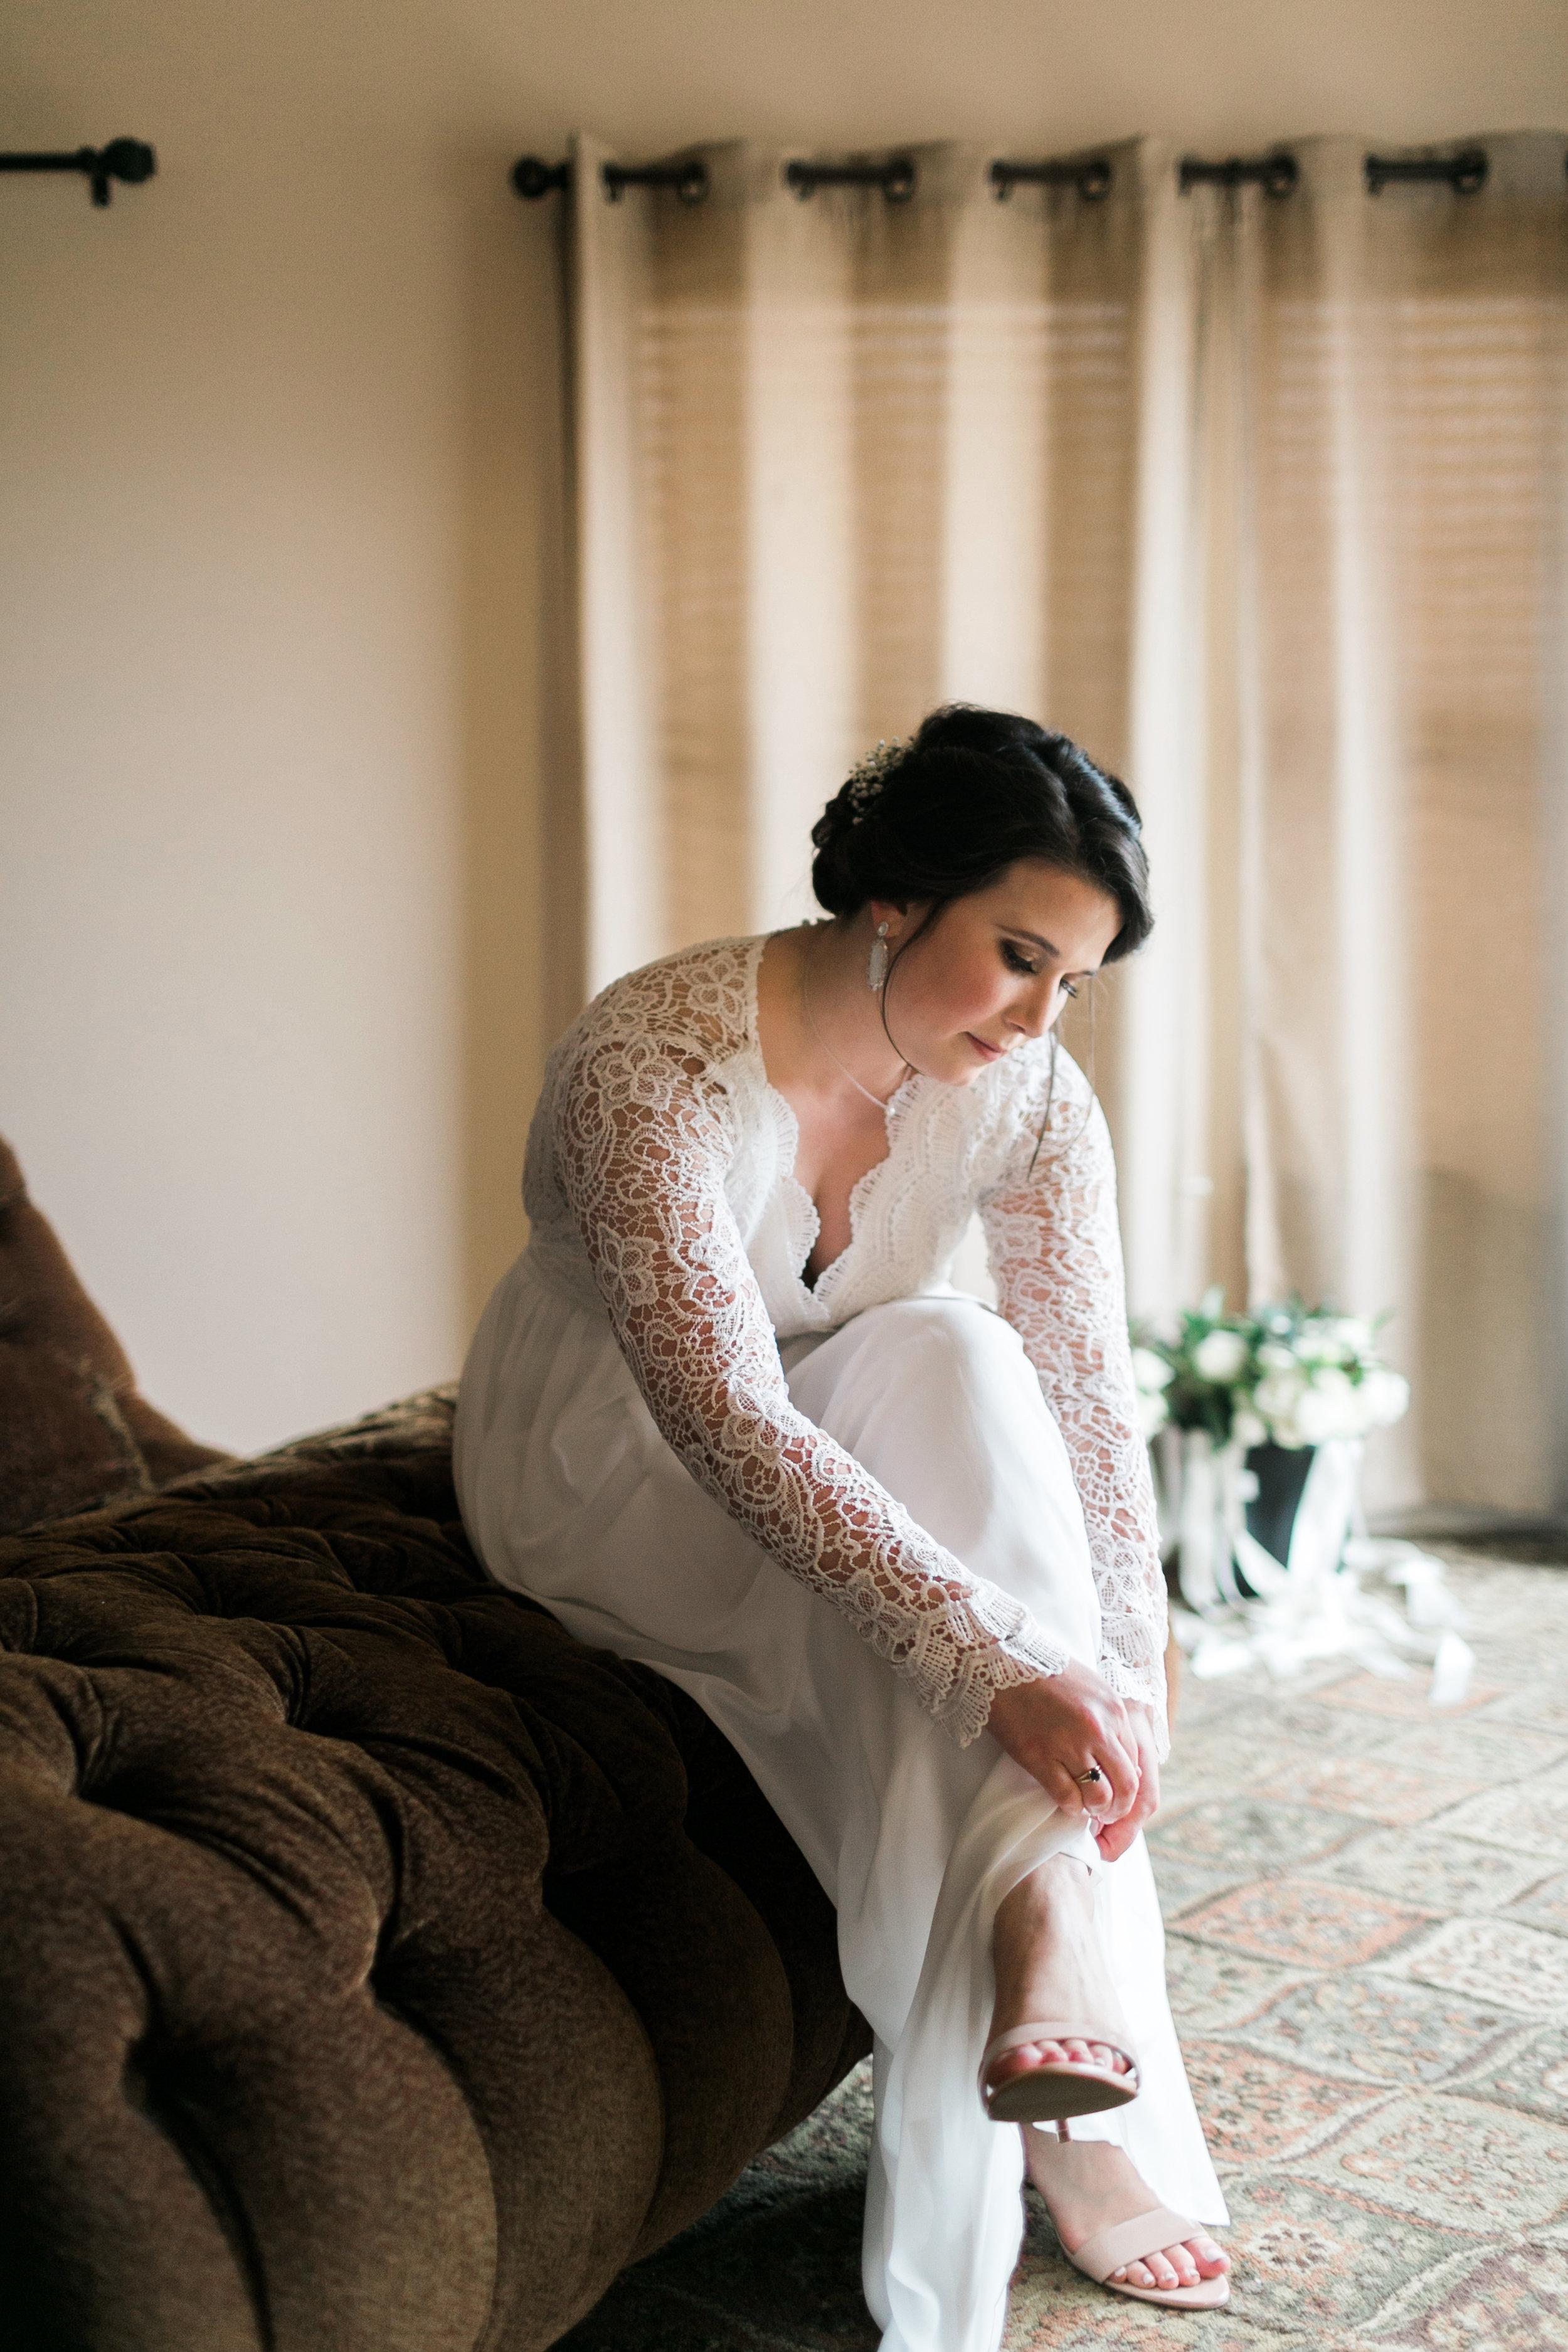 Austin_Texas_Fine_Art_Wedding_Photographer_Kayla_Snell_Photography_Antebellum_Oaks161.jpg